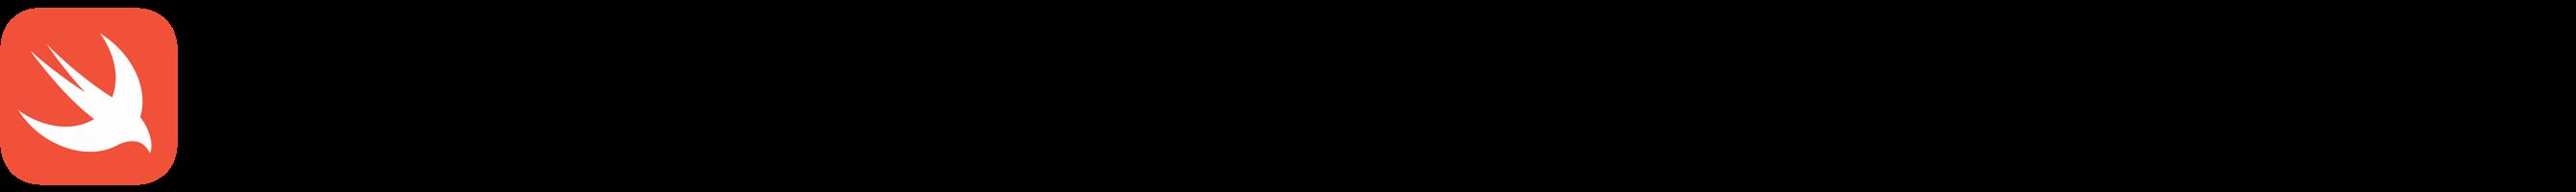 Swift Coroutine